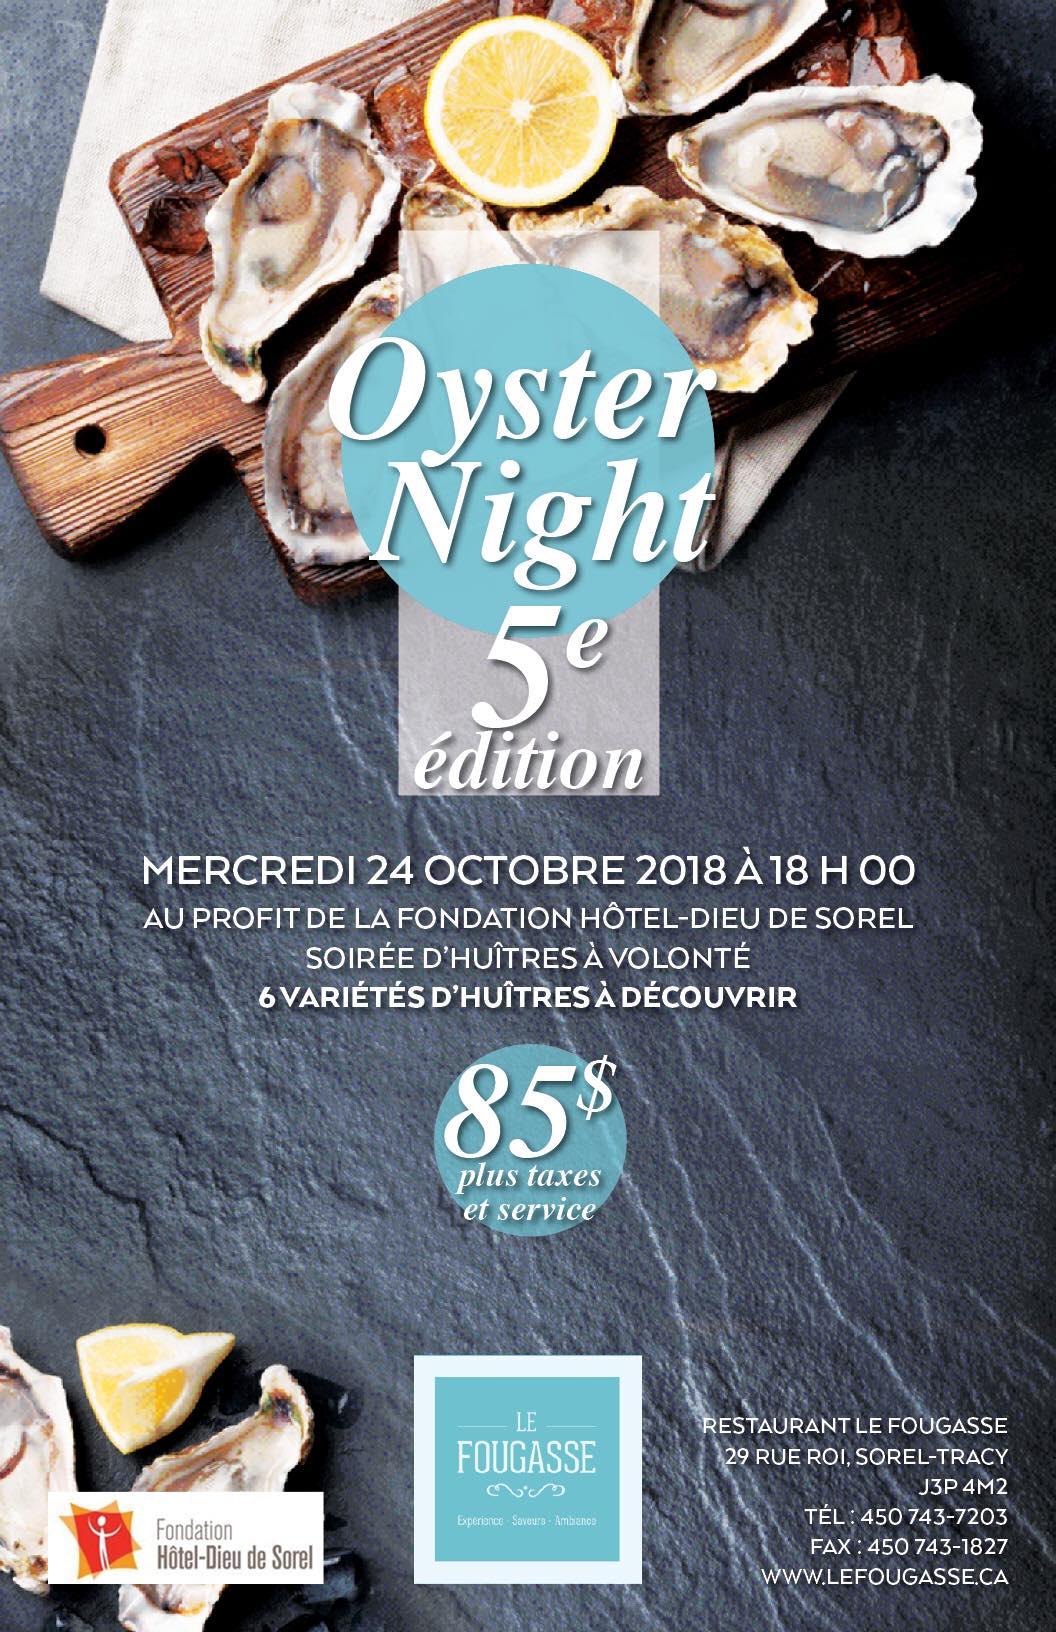 affiche oyster nigh 5e édition fondation hotel-dieu